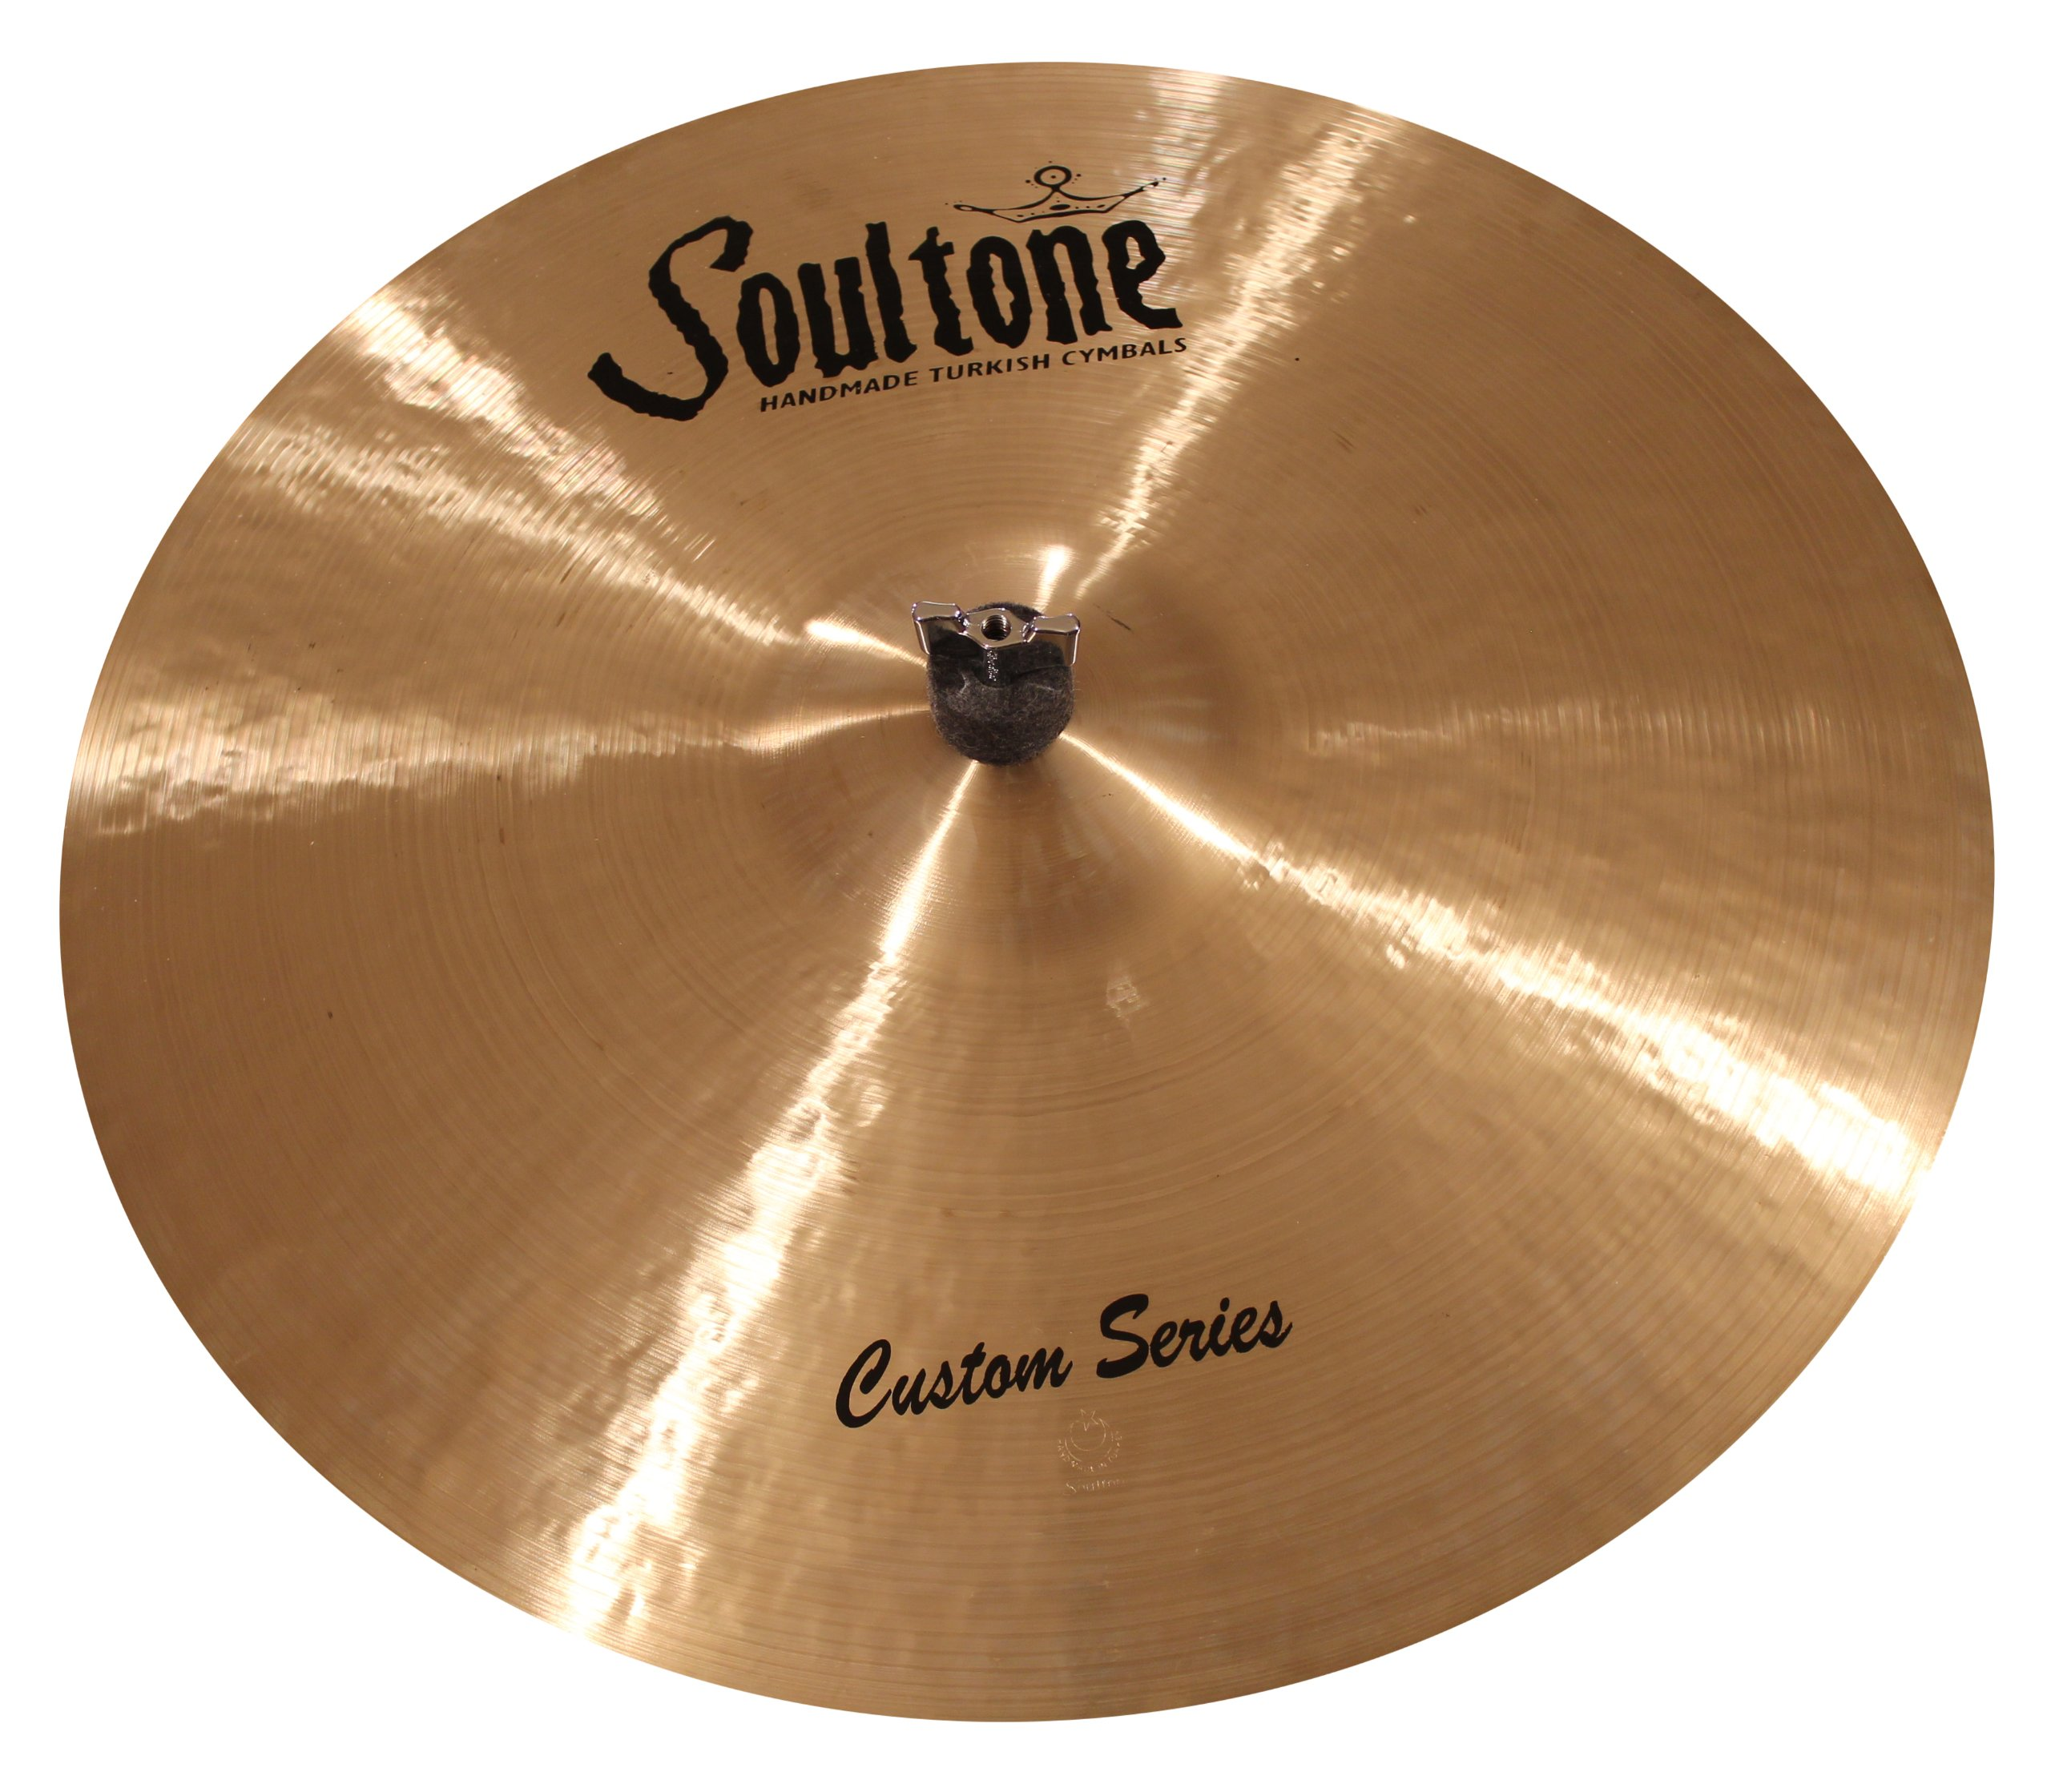 Soultone Cymbals CST-RID21-21'' Custom Ride